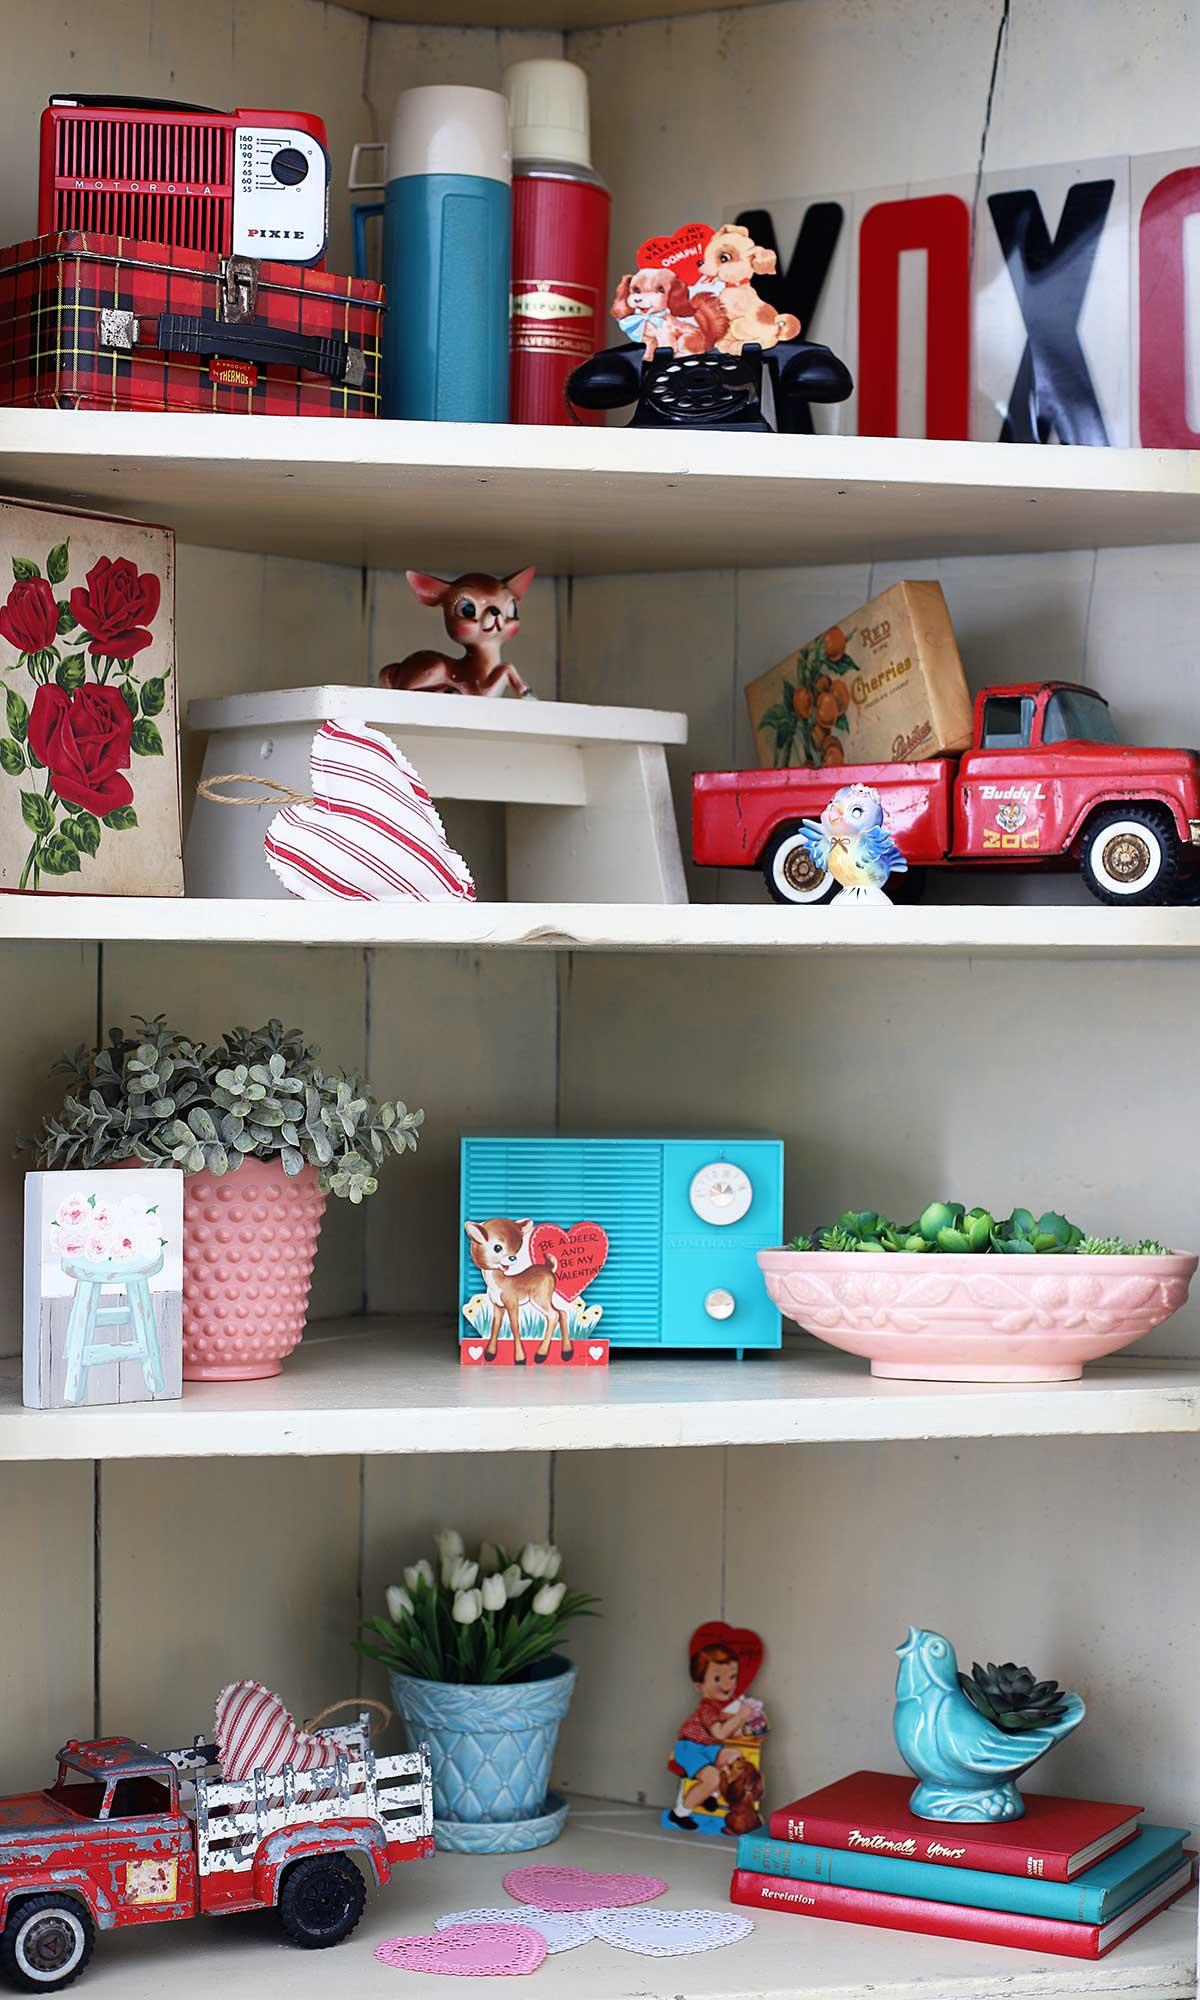 Vintage Valentines Day decor displayed in a bookshelf